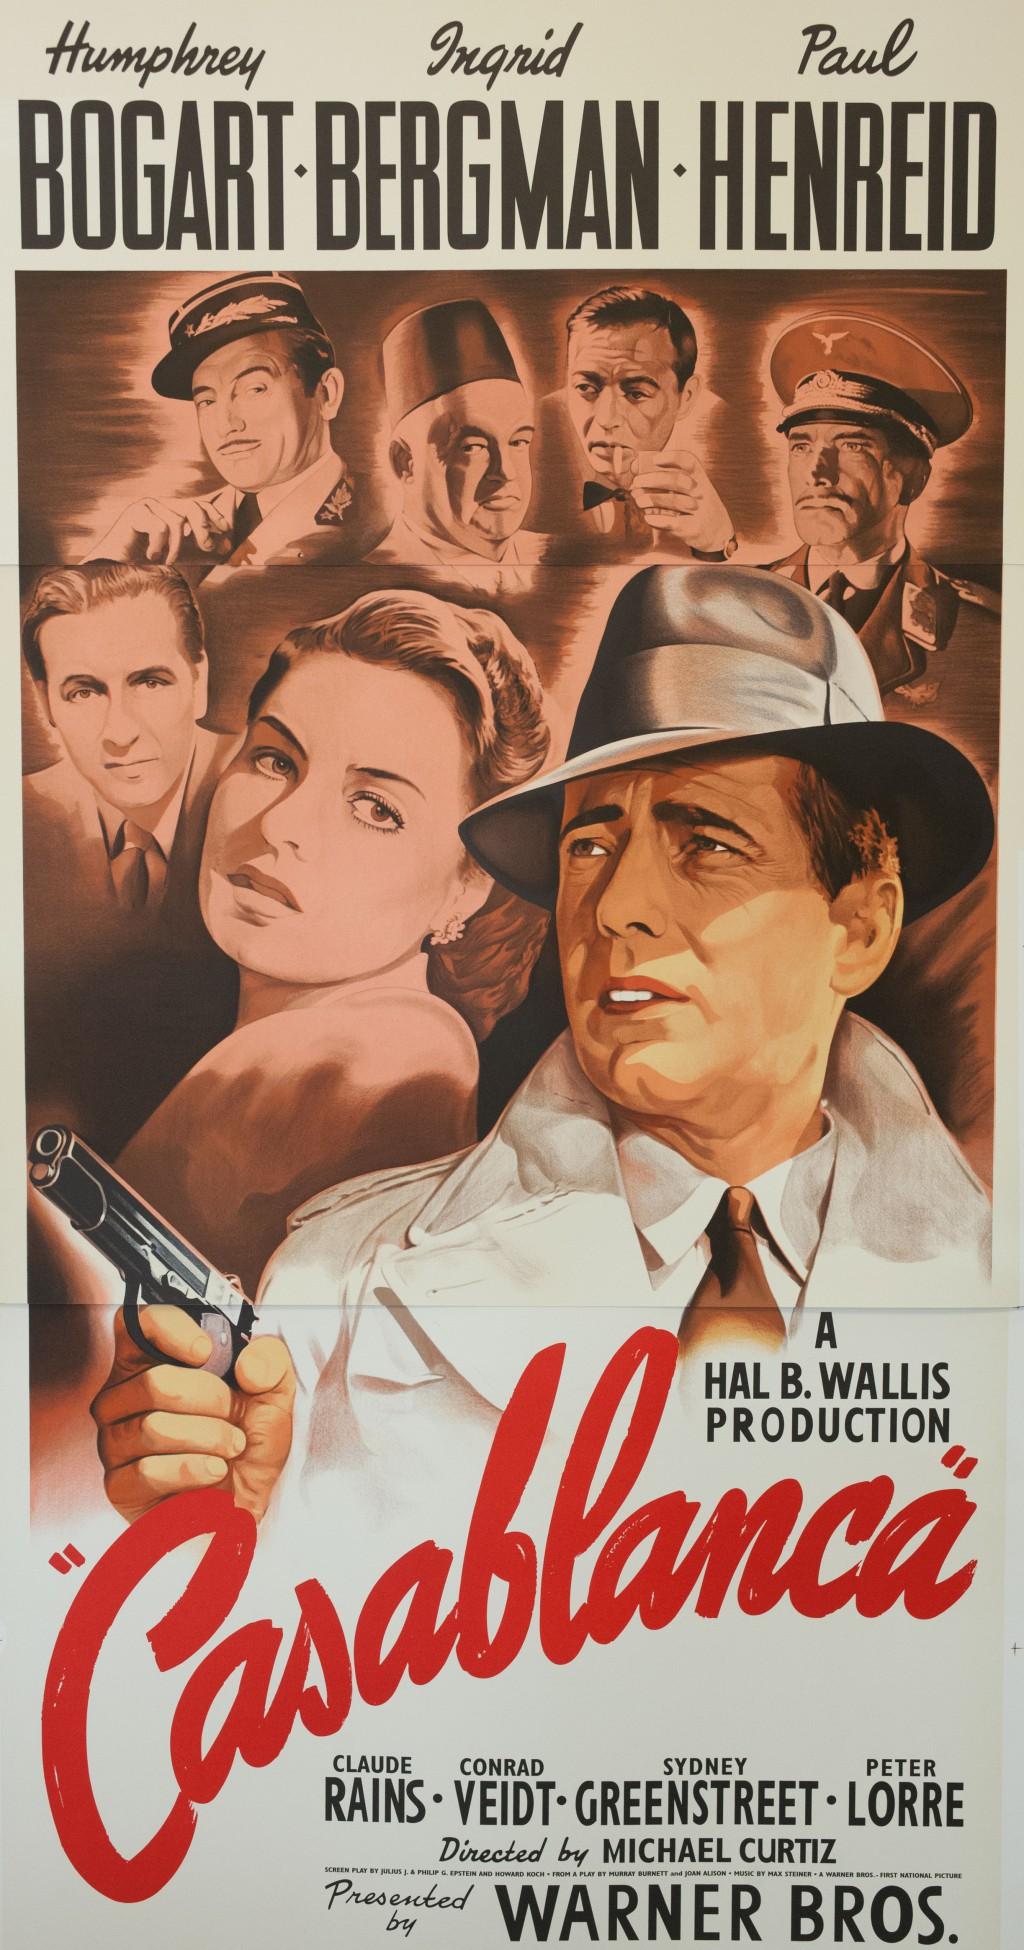 Casablanca Humphrey Bogart Ingrid Bergman Classic movie poster vintage movie poster fine art film vintage poster